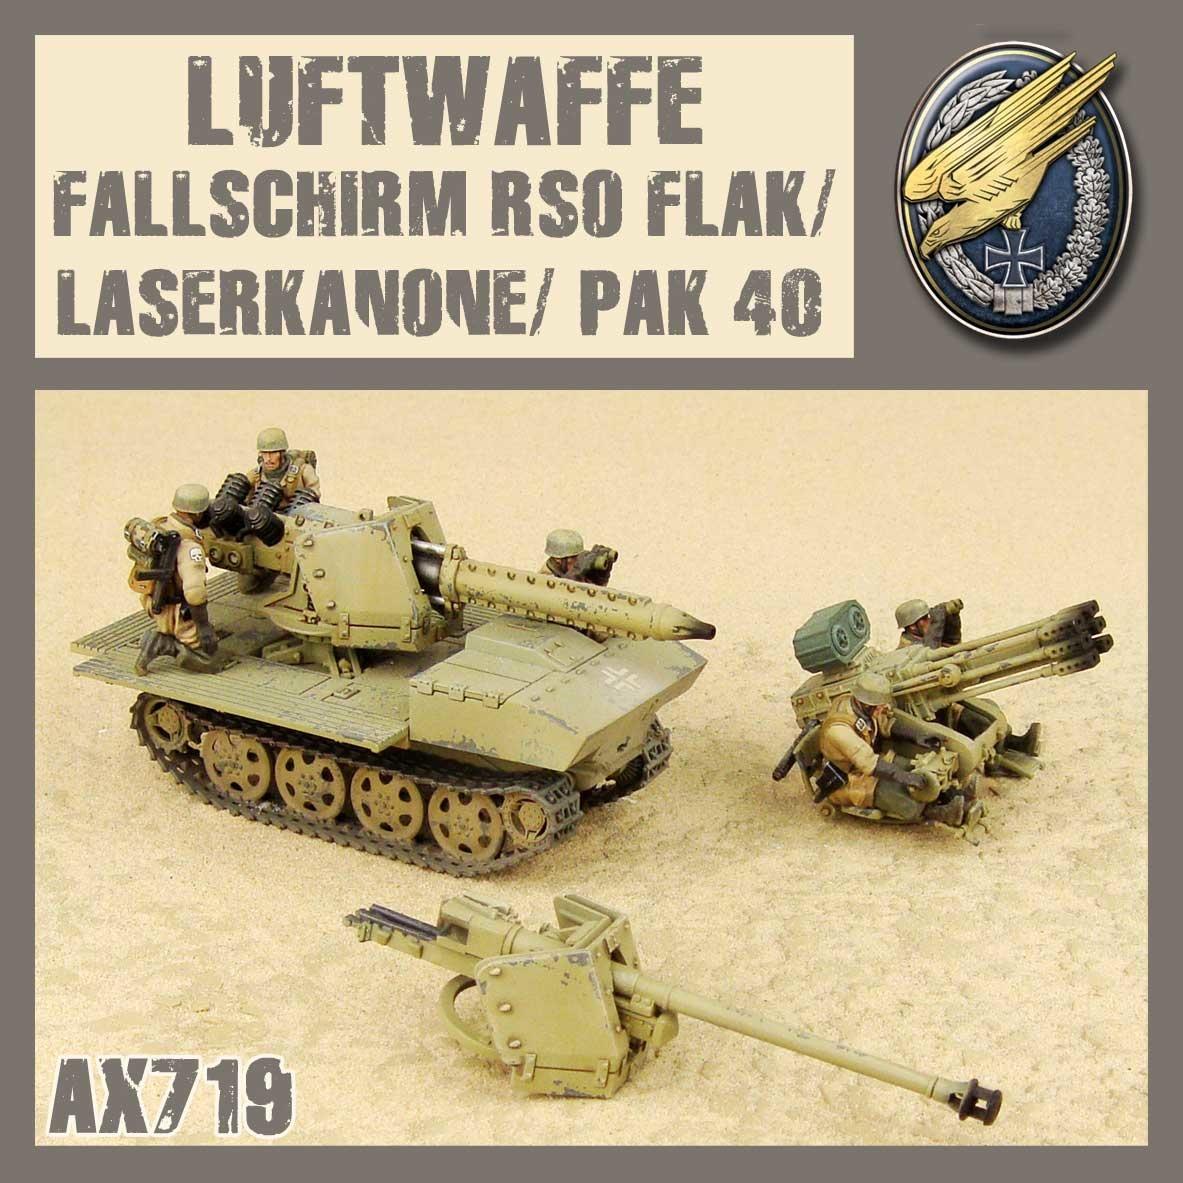 DUST USA DUST DROP-SHIP: Fallschirm RSO Flak3/Pak40/Laserkanone